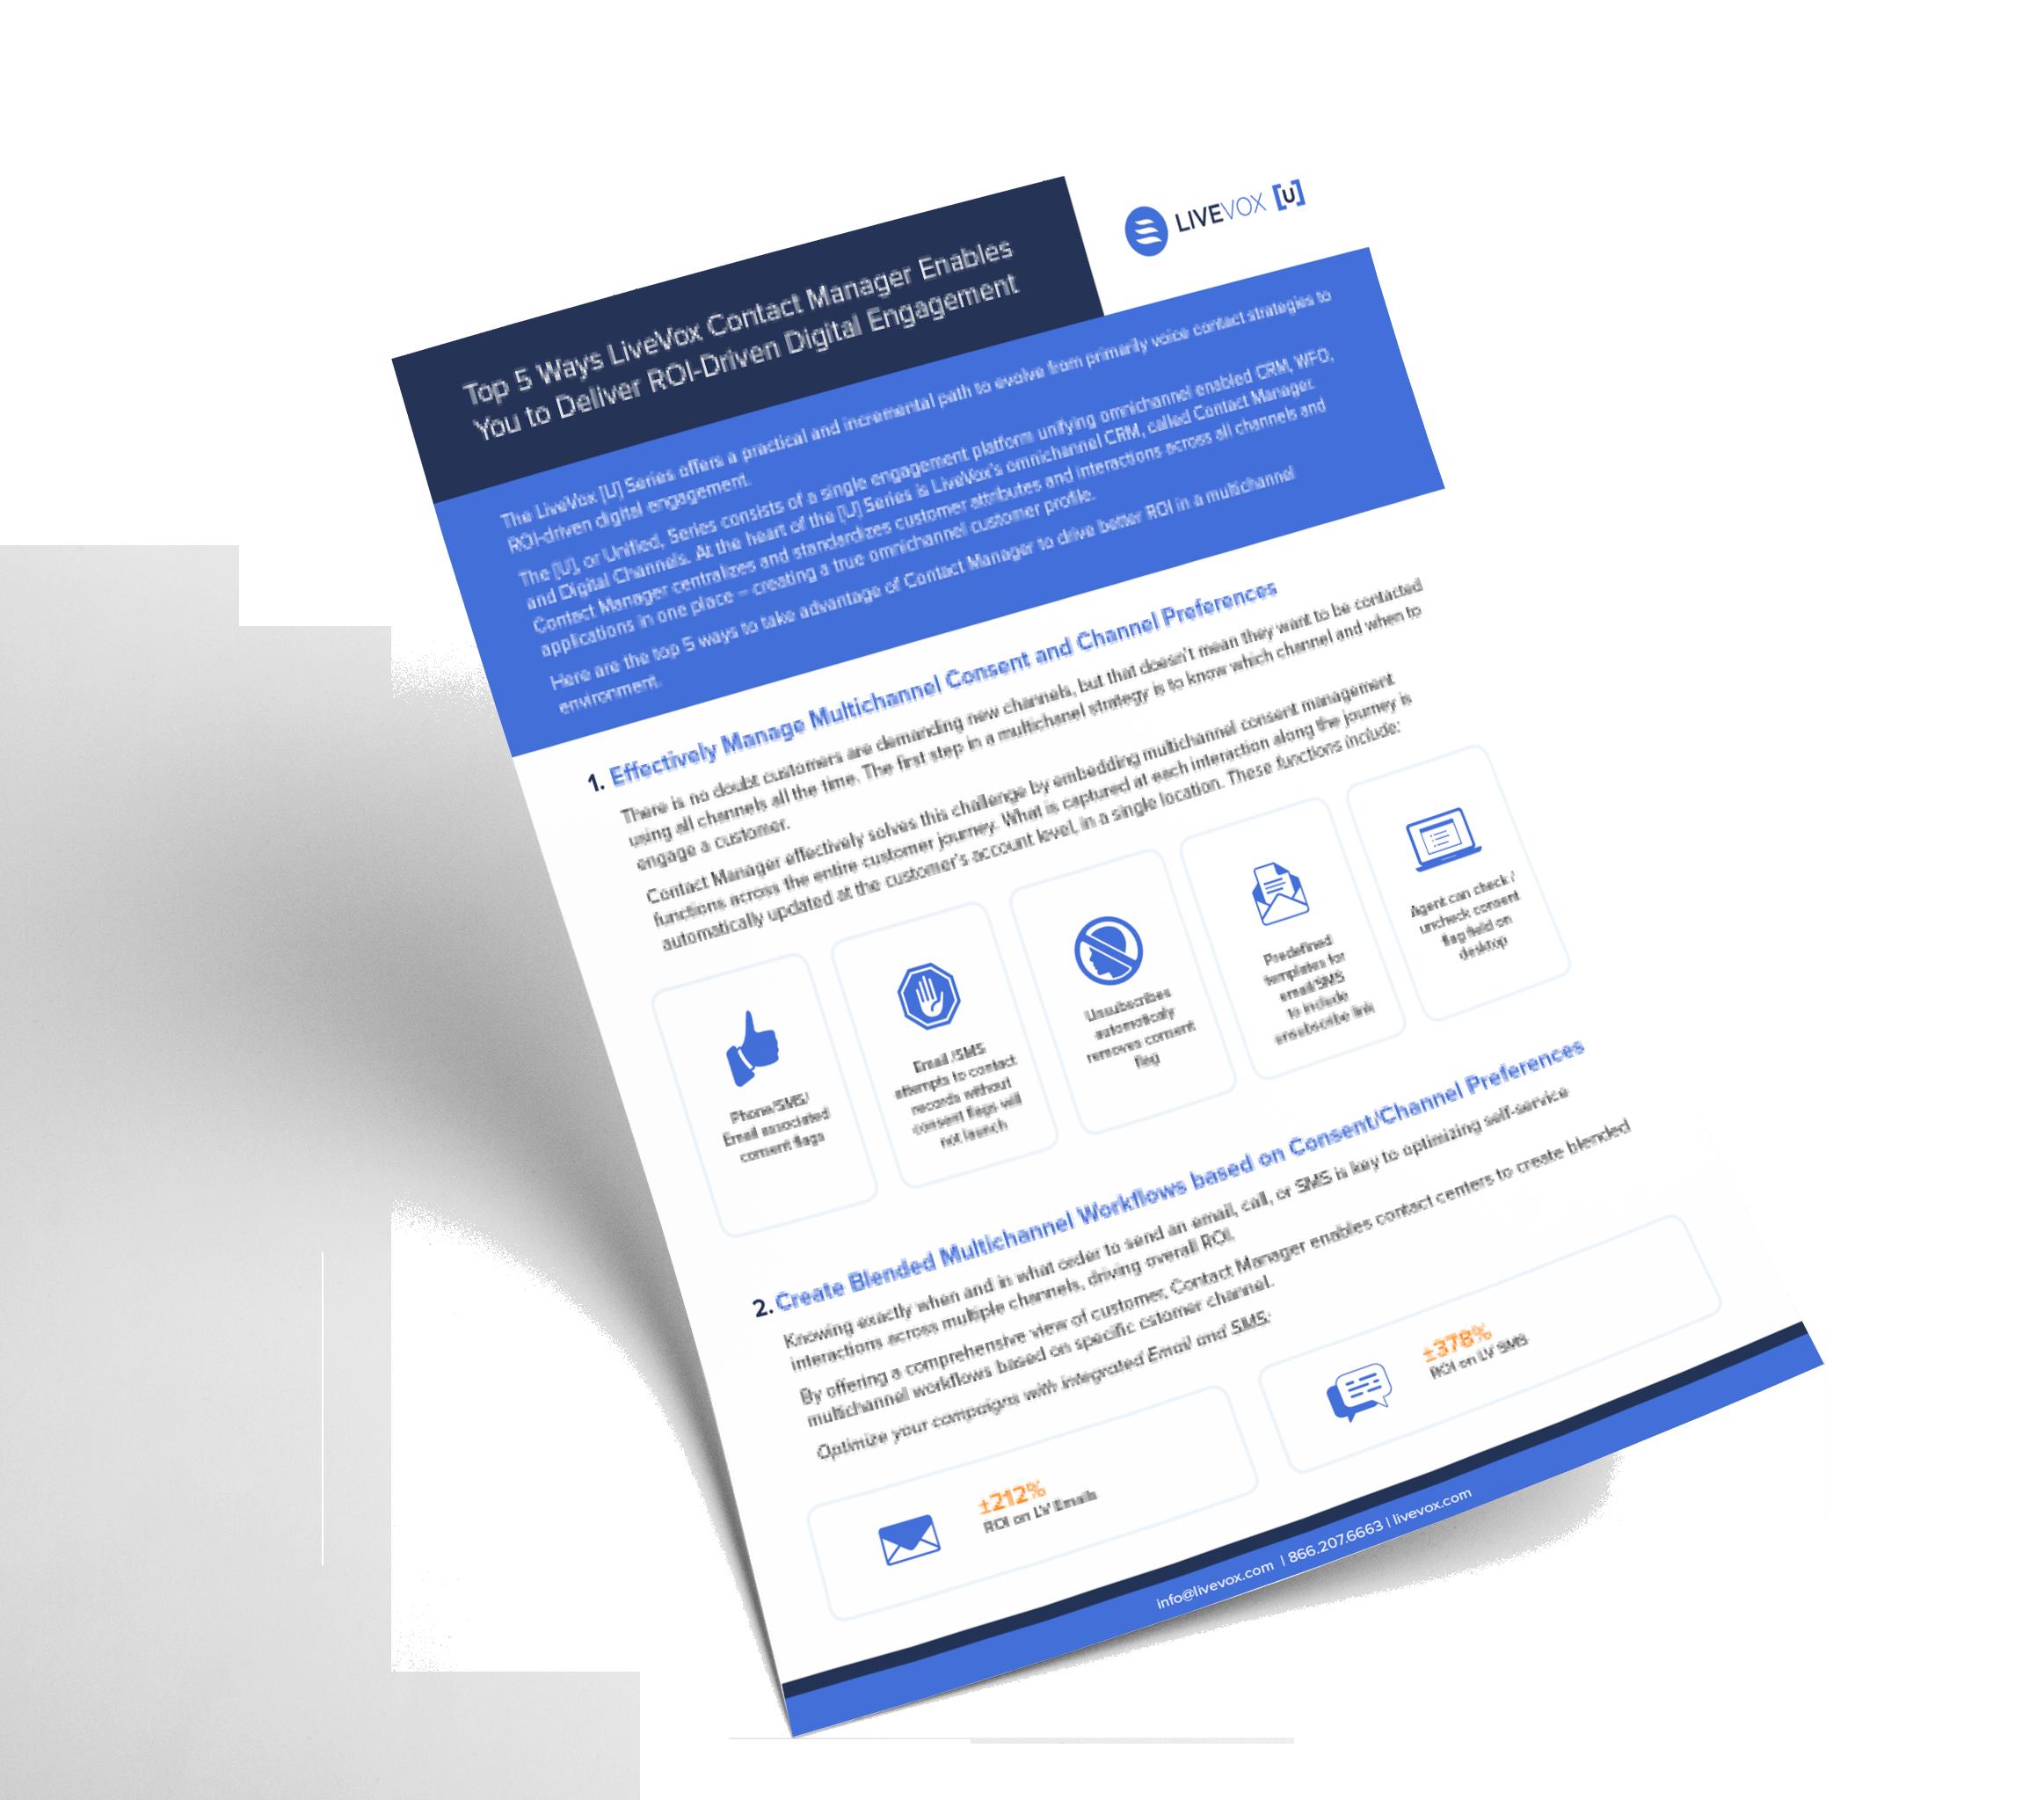 LiveVox Contact Manager Tip Sheet